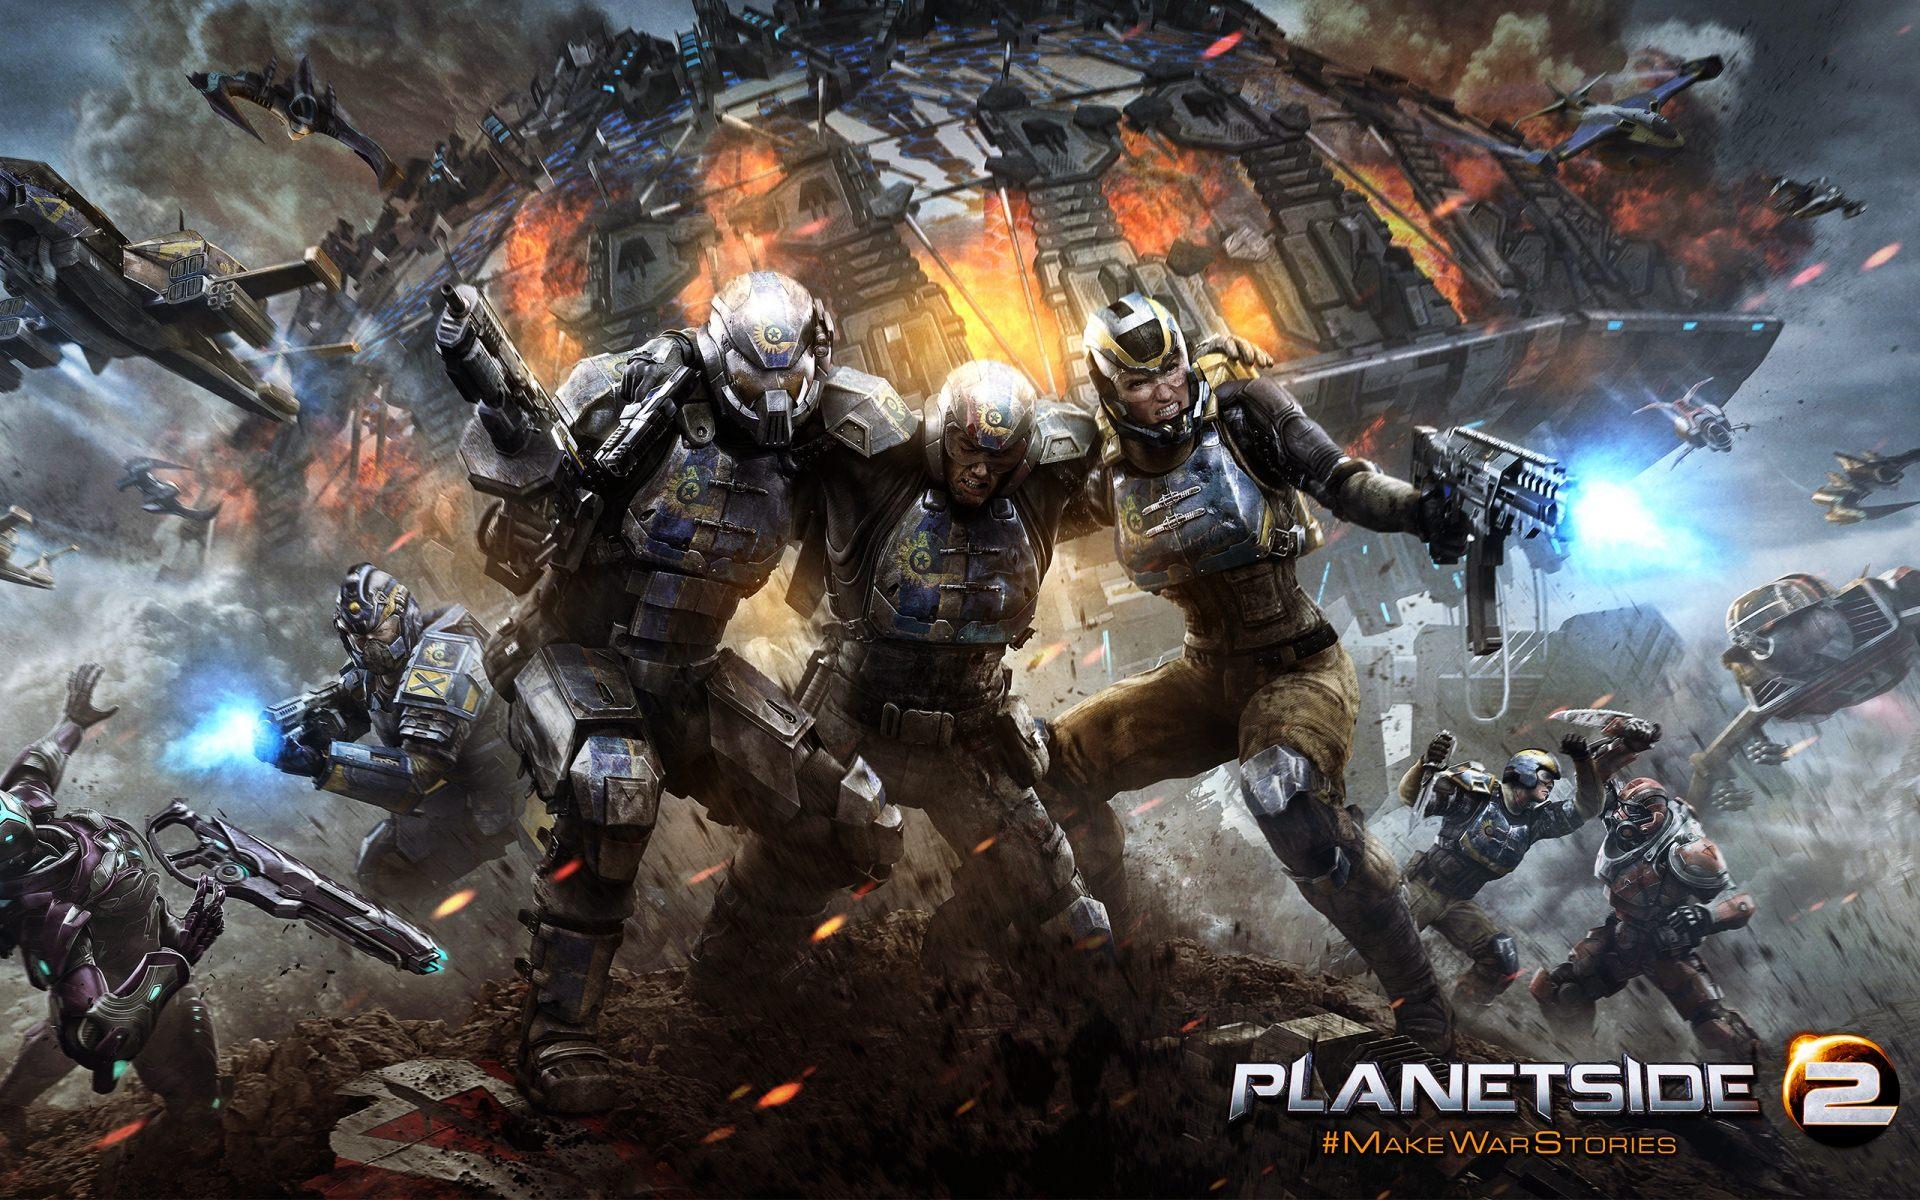 awesome planetside 2 wallpaper 43298